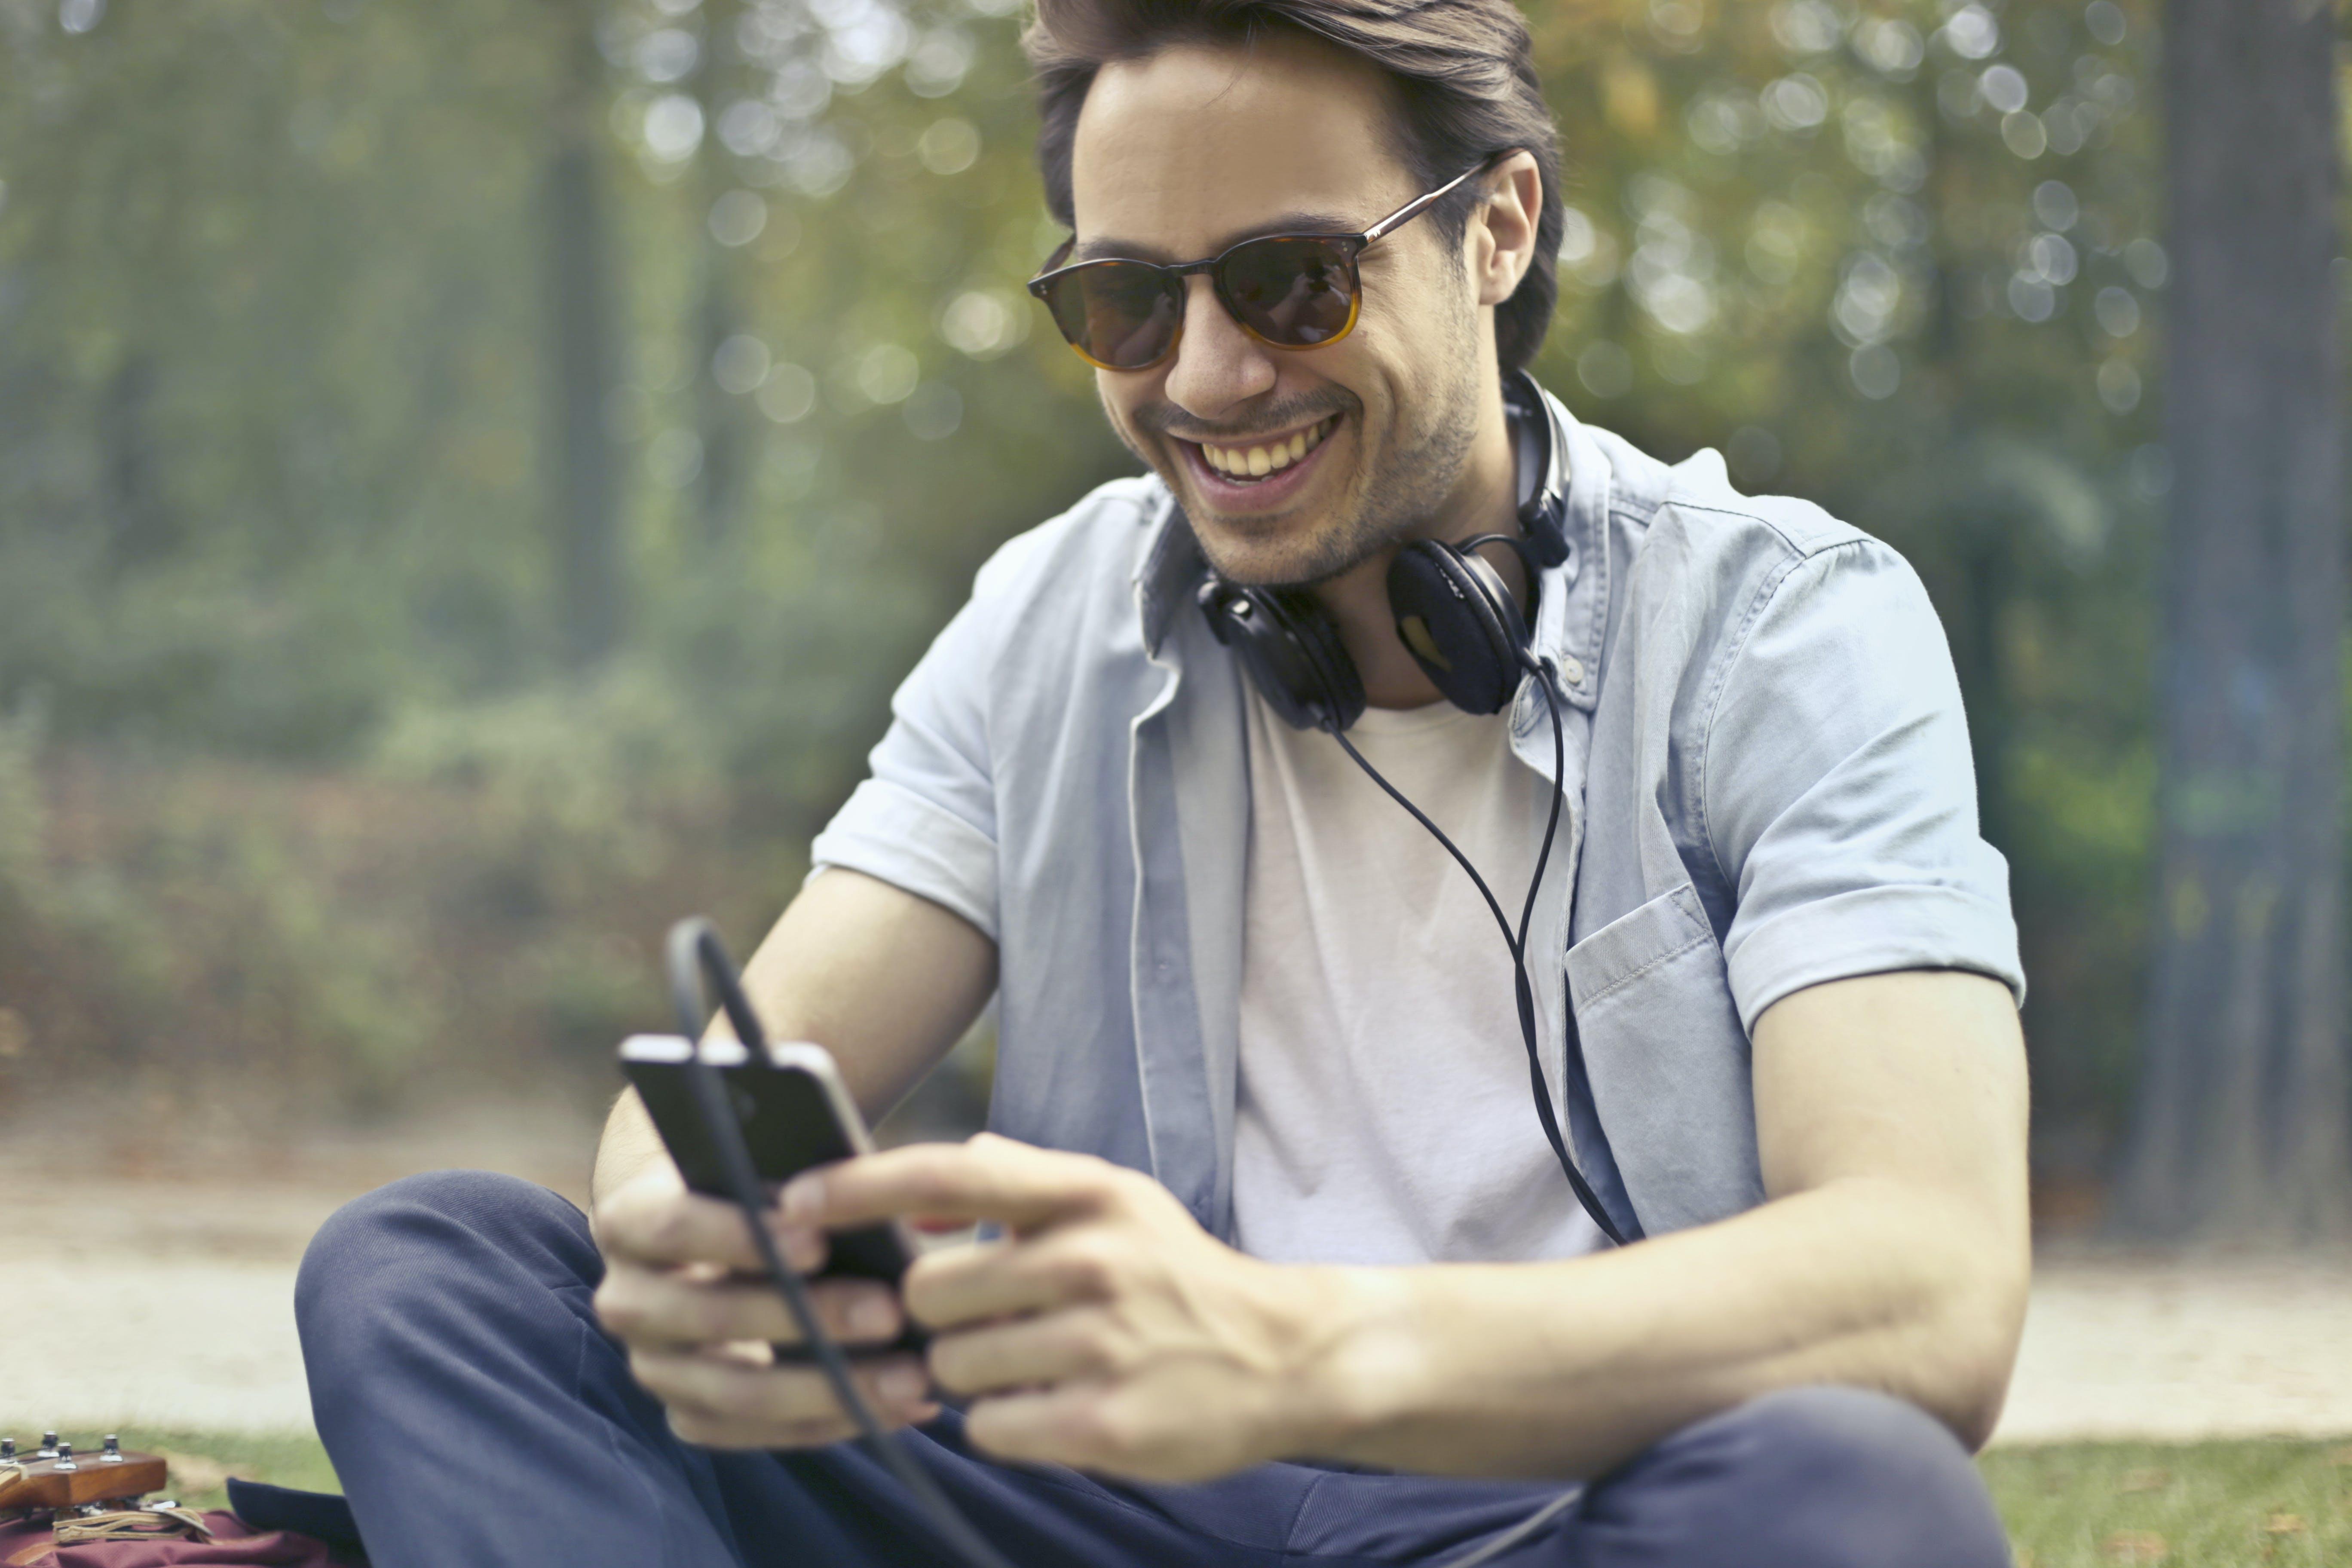 Man Wearing Sunglasses Using Smartphone at Daytime